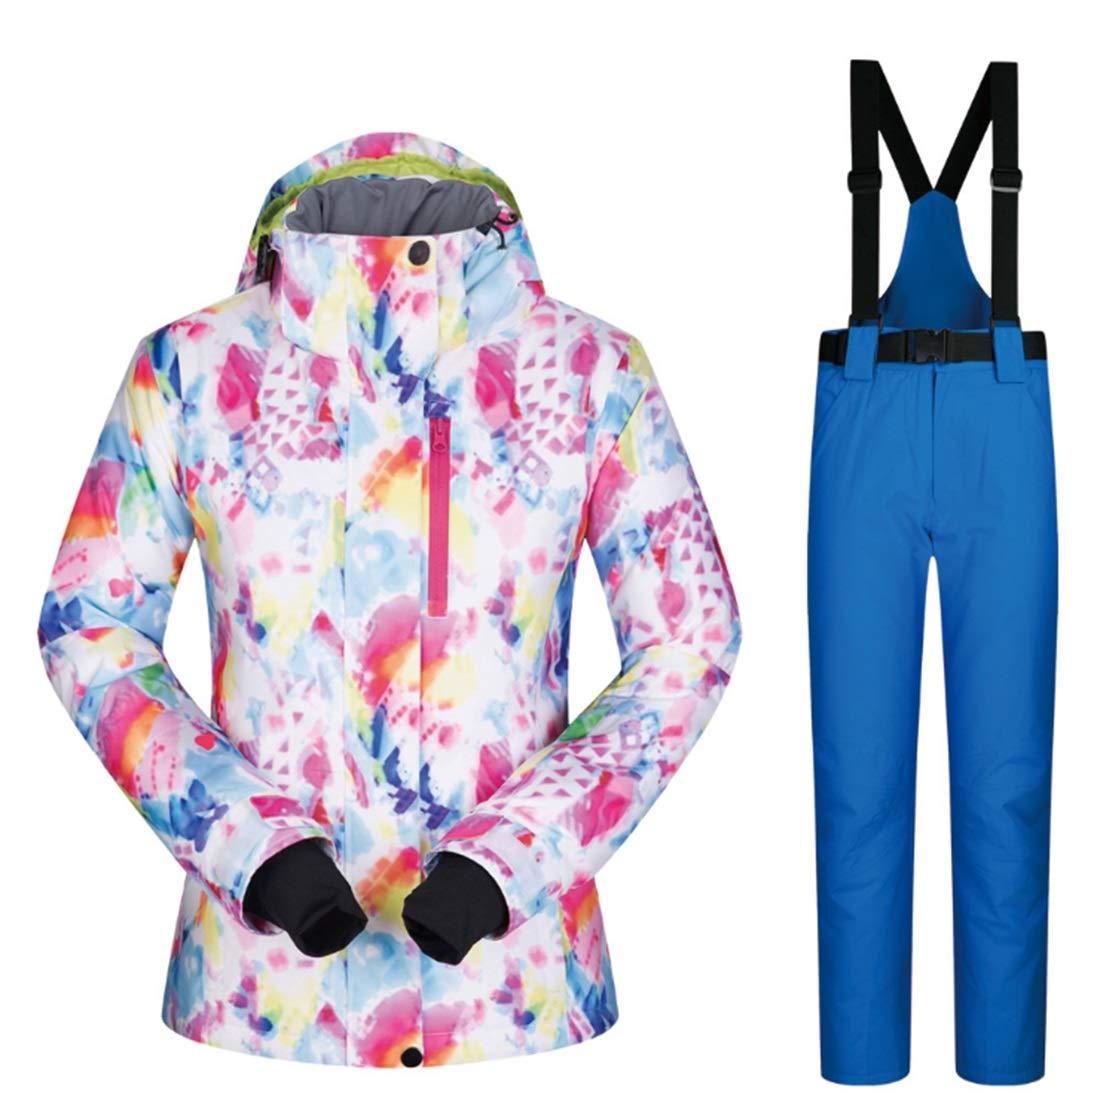 YXDIANZI 女性のスキー ジャケット高防風防水技術スノー ジャケットS-XL (色 : 09, サイズ : L)  Large